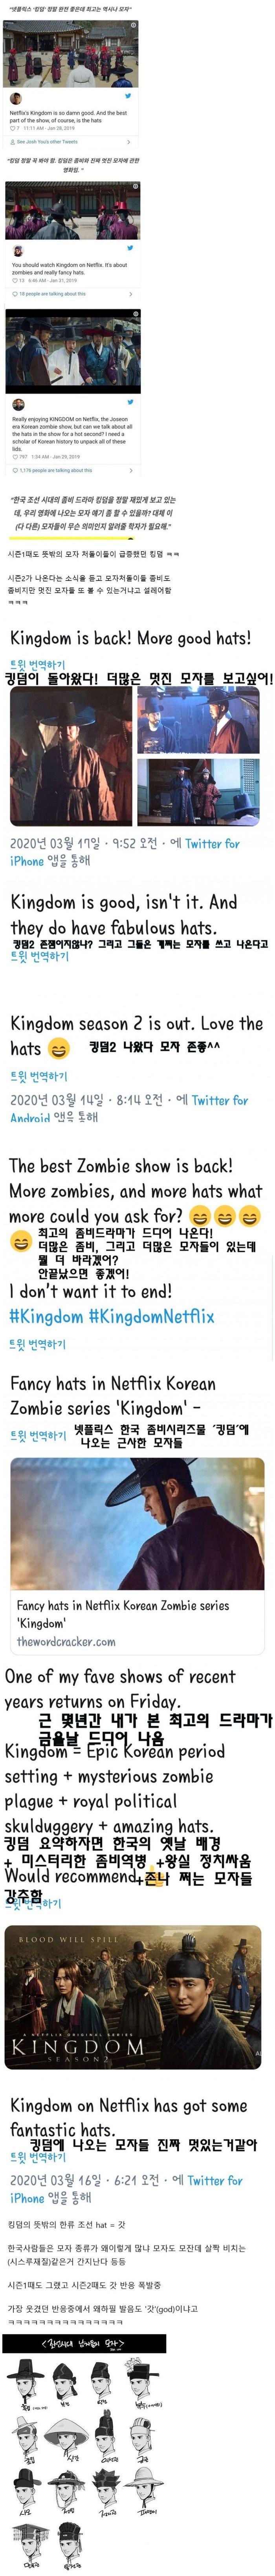 Netflix kingdom 2  킹덤 시즌 2  외국인들의 반응